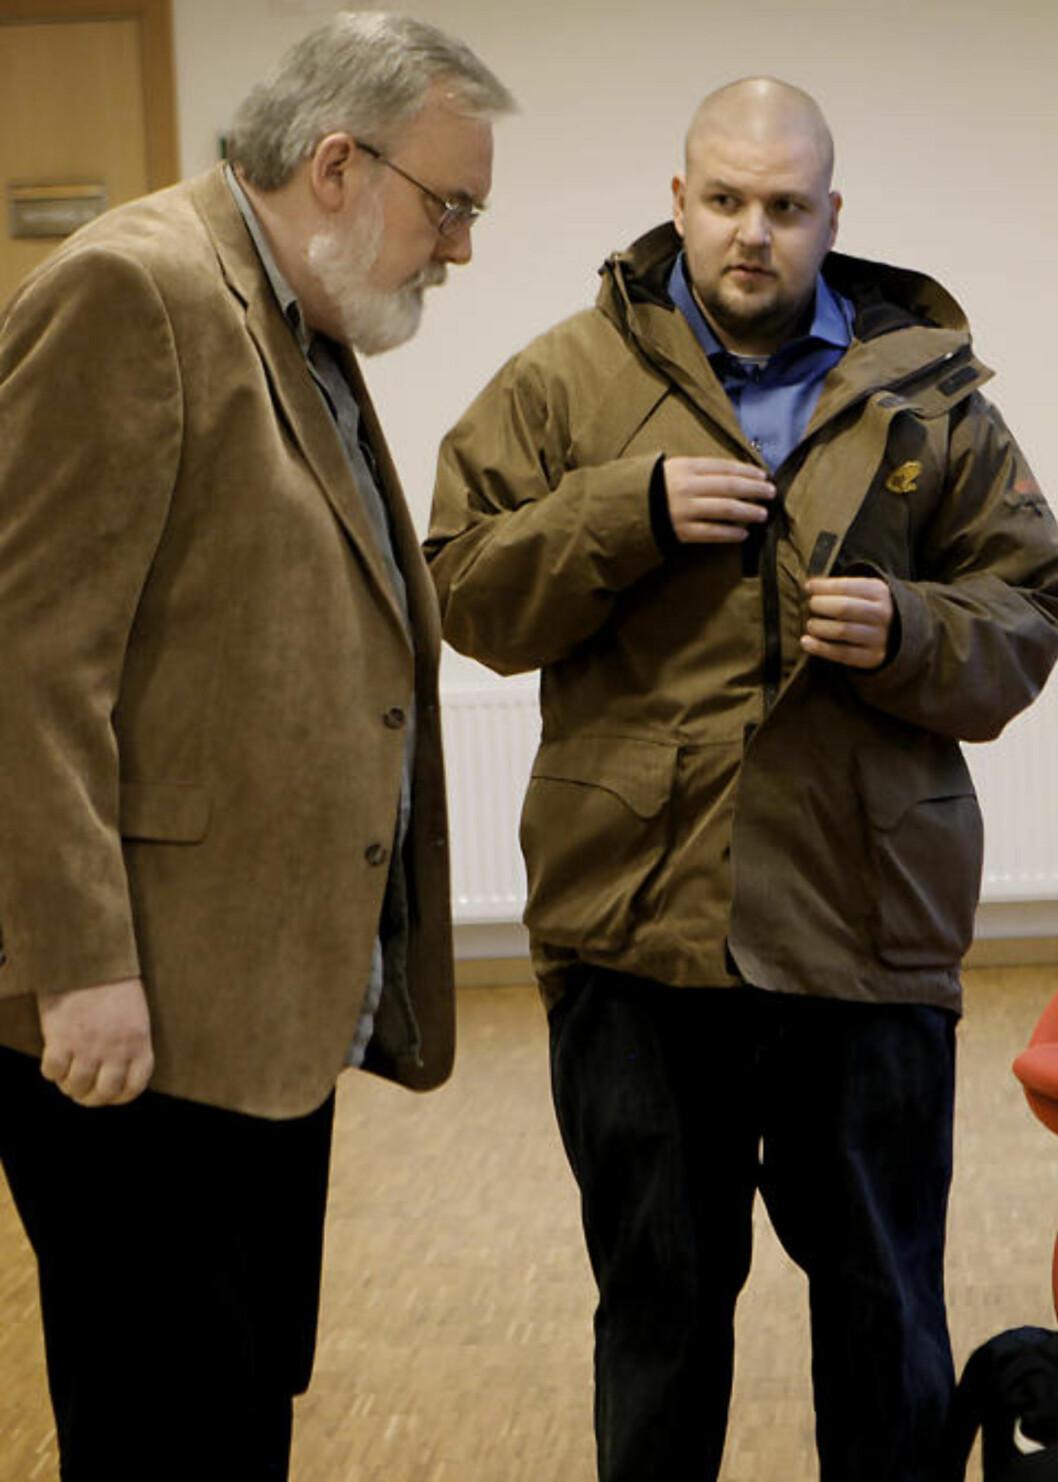 <strong>DAGLIG LEDER:</strong> Daglig leder og SOS Rasismes mektigste mann, Kjell Gunnar Larsen står sammen med nestleder Kenneth Fuglemsmo. Larsen er styremedlem i den kommunistiske gruppa Tjen Folket. Fuglemsmo leder ungdomsavdelingen der, Revolusjonær kommunistisk Ungdom. Foto: ERLING HÆGELAND/Dagbladet